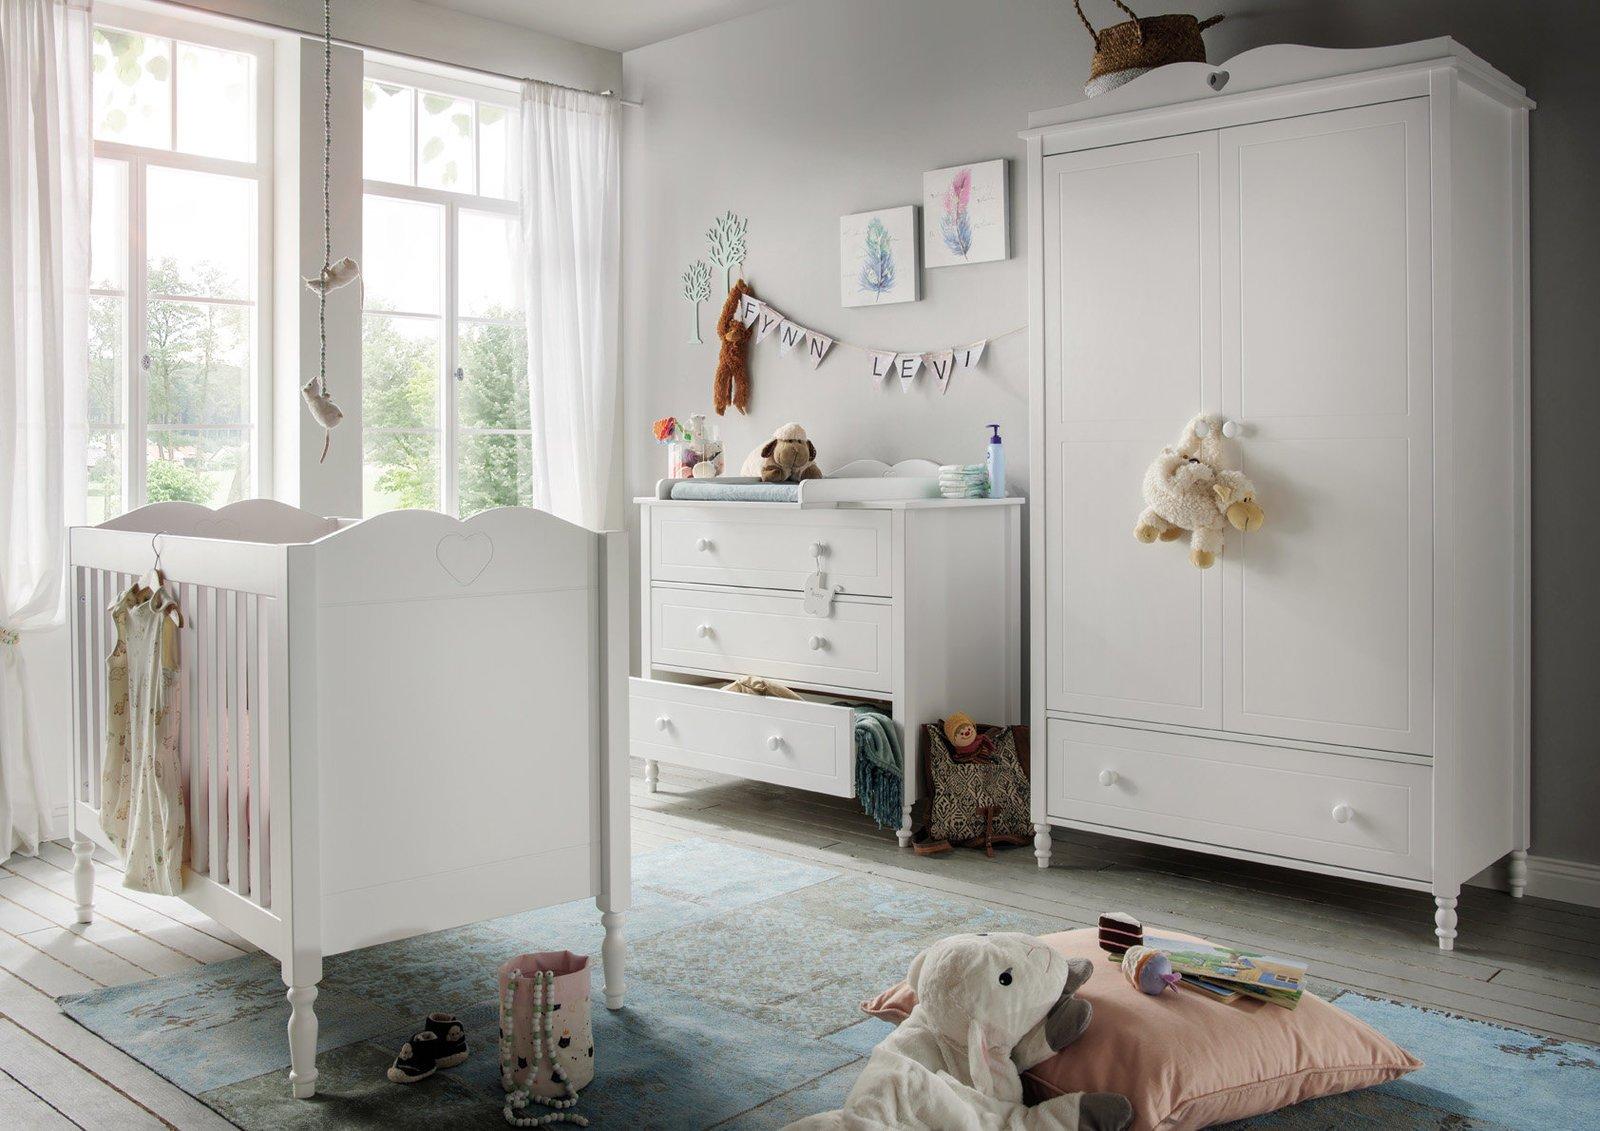 InfansKids Babyzimmer Emma, Bild 4